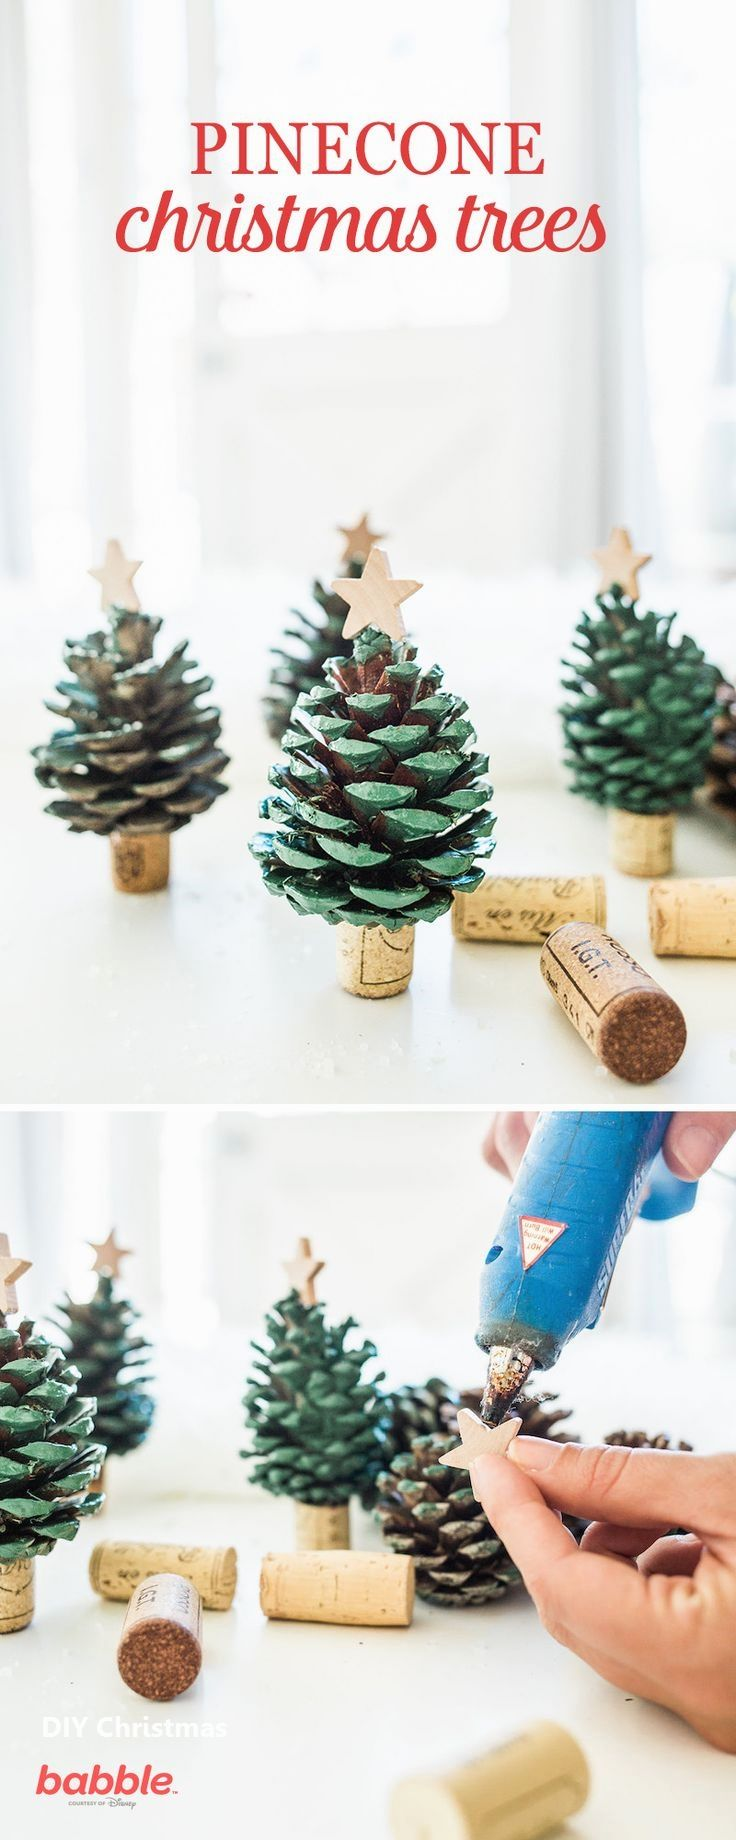 DIY Christmas 2020 Trends diychristmas Christmas decor